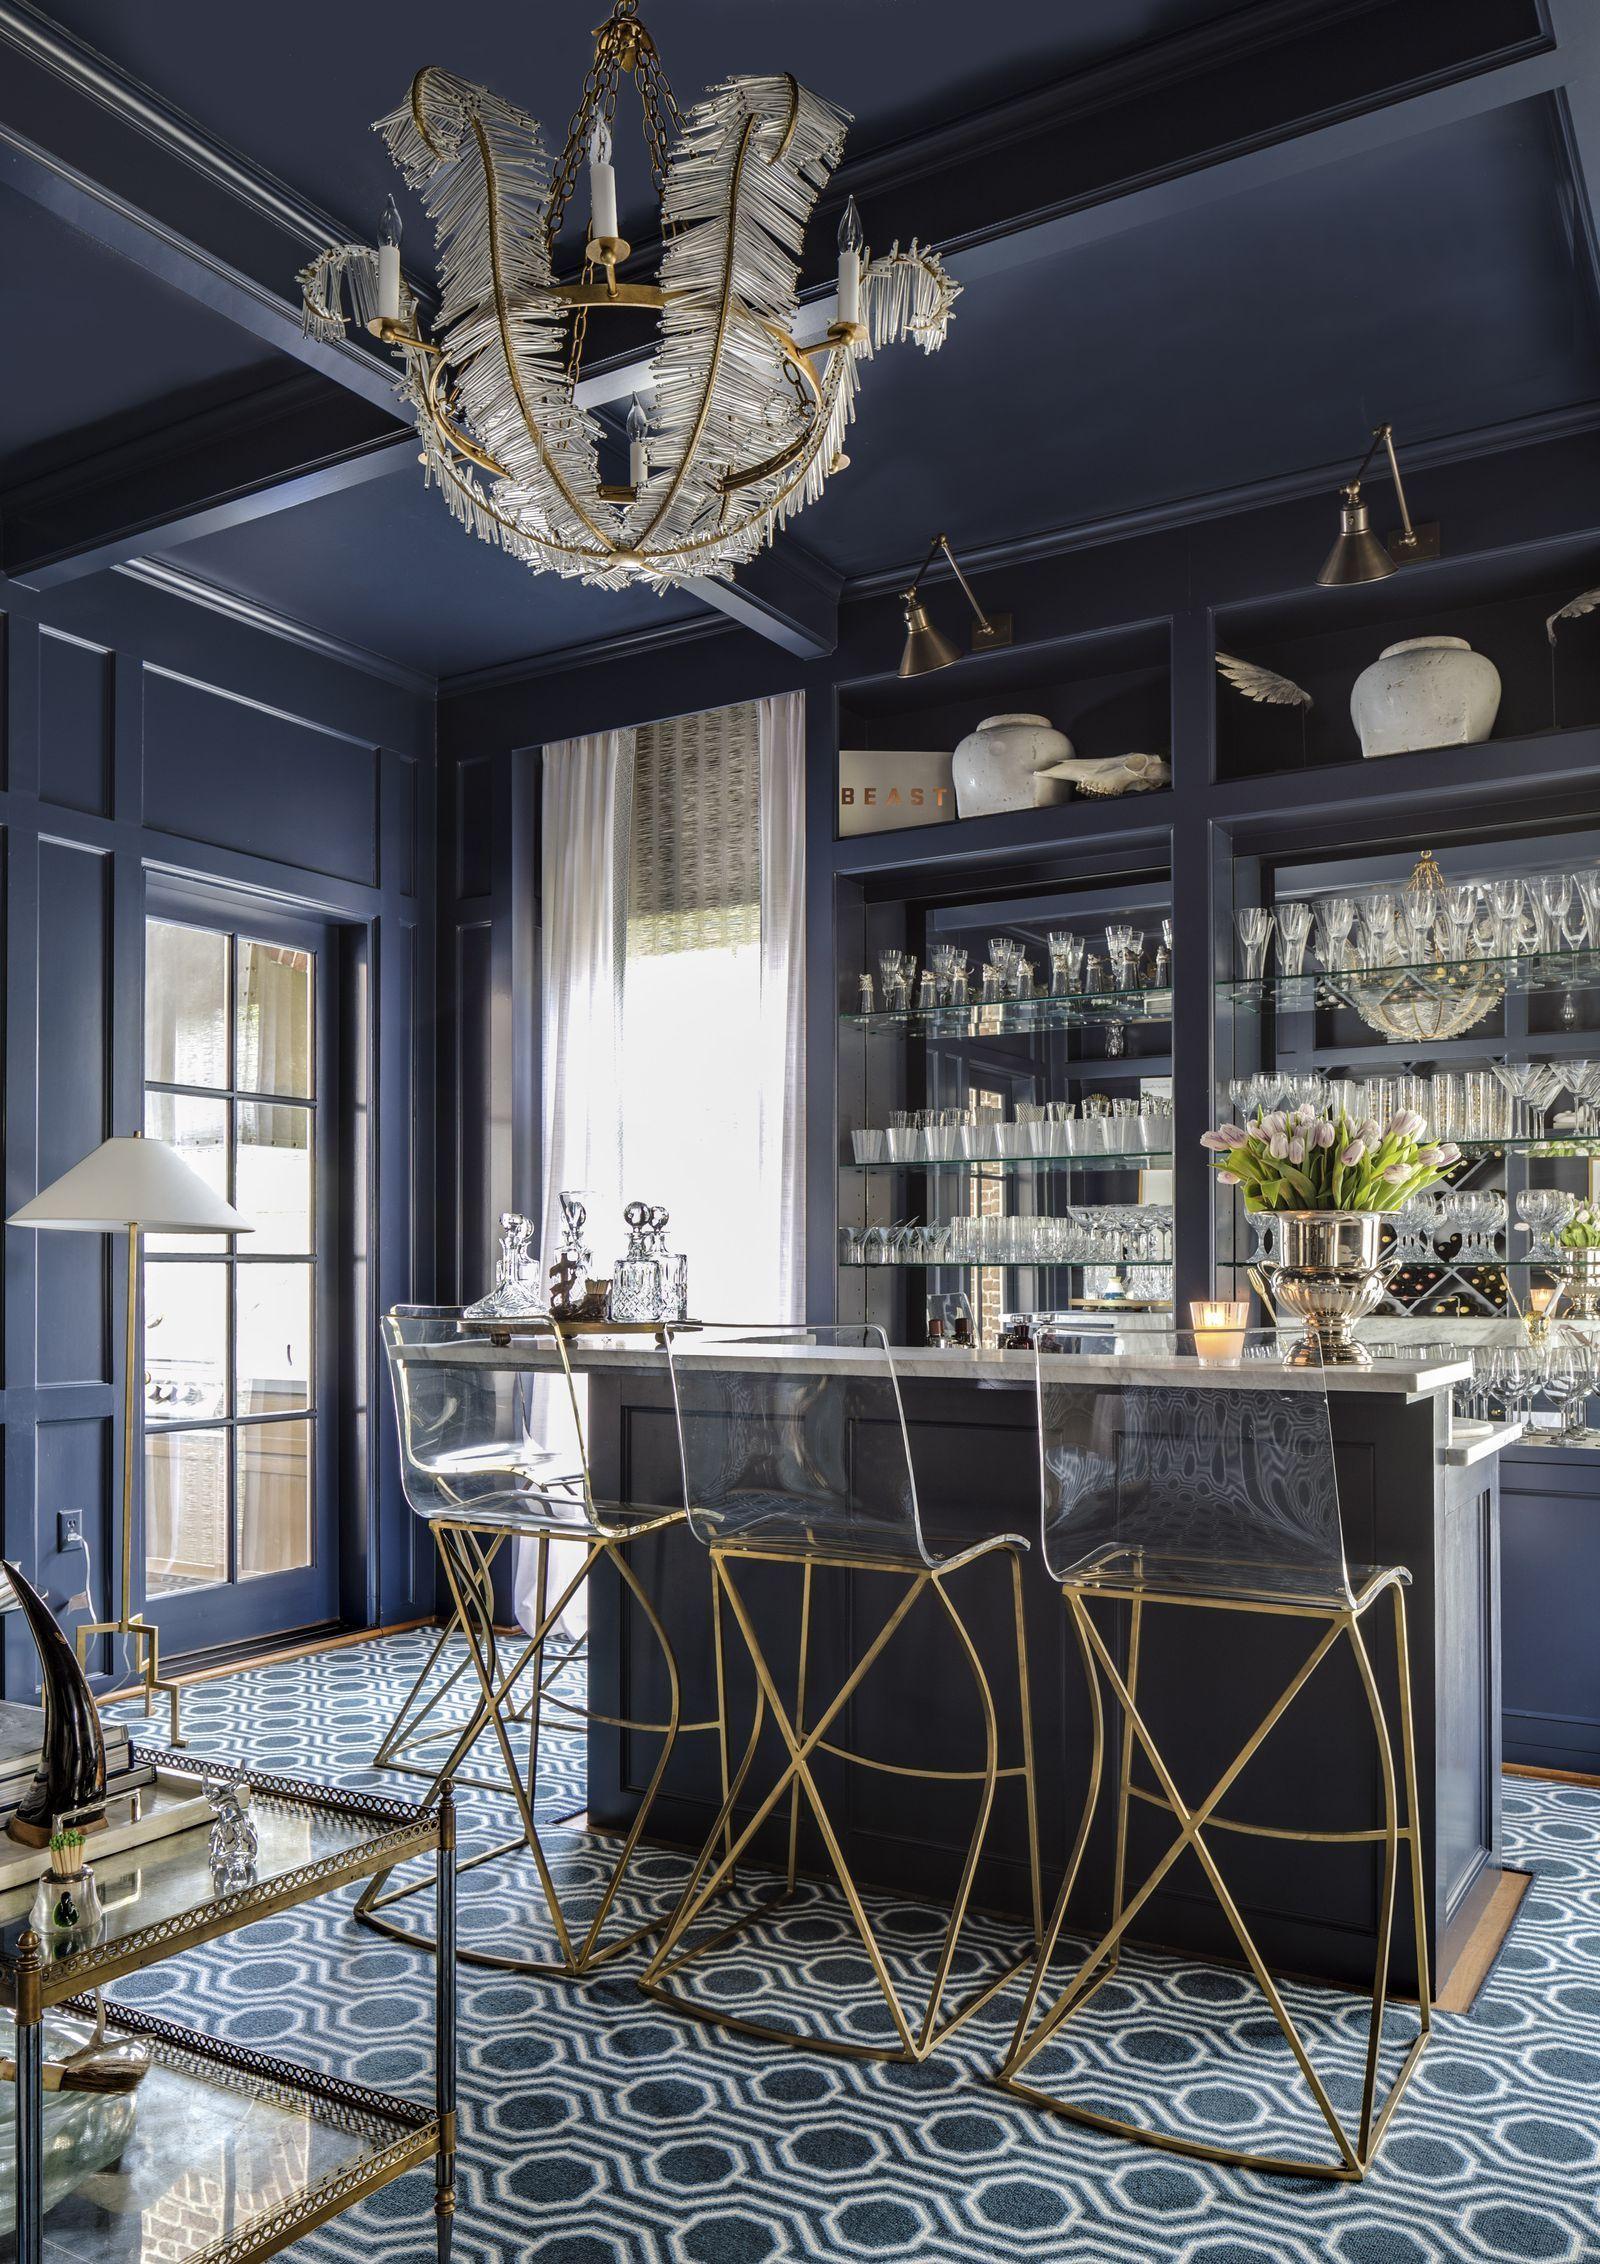 Top 10 Breathtaking Home Bar Designs